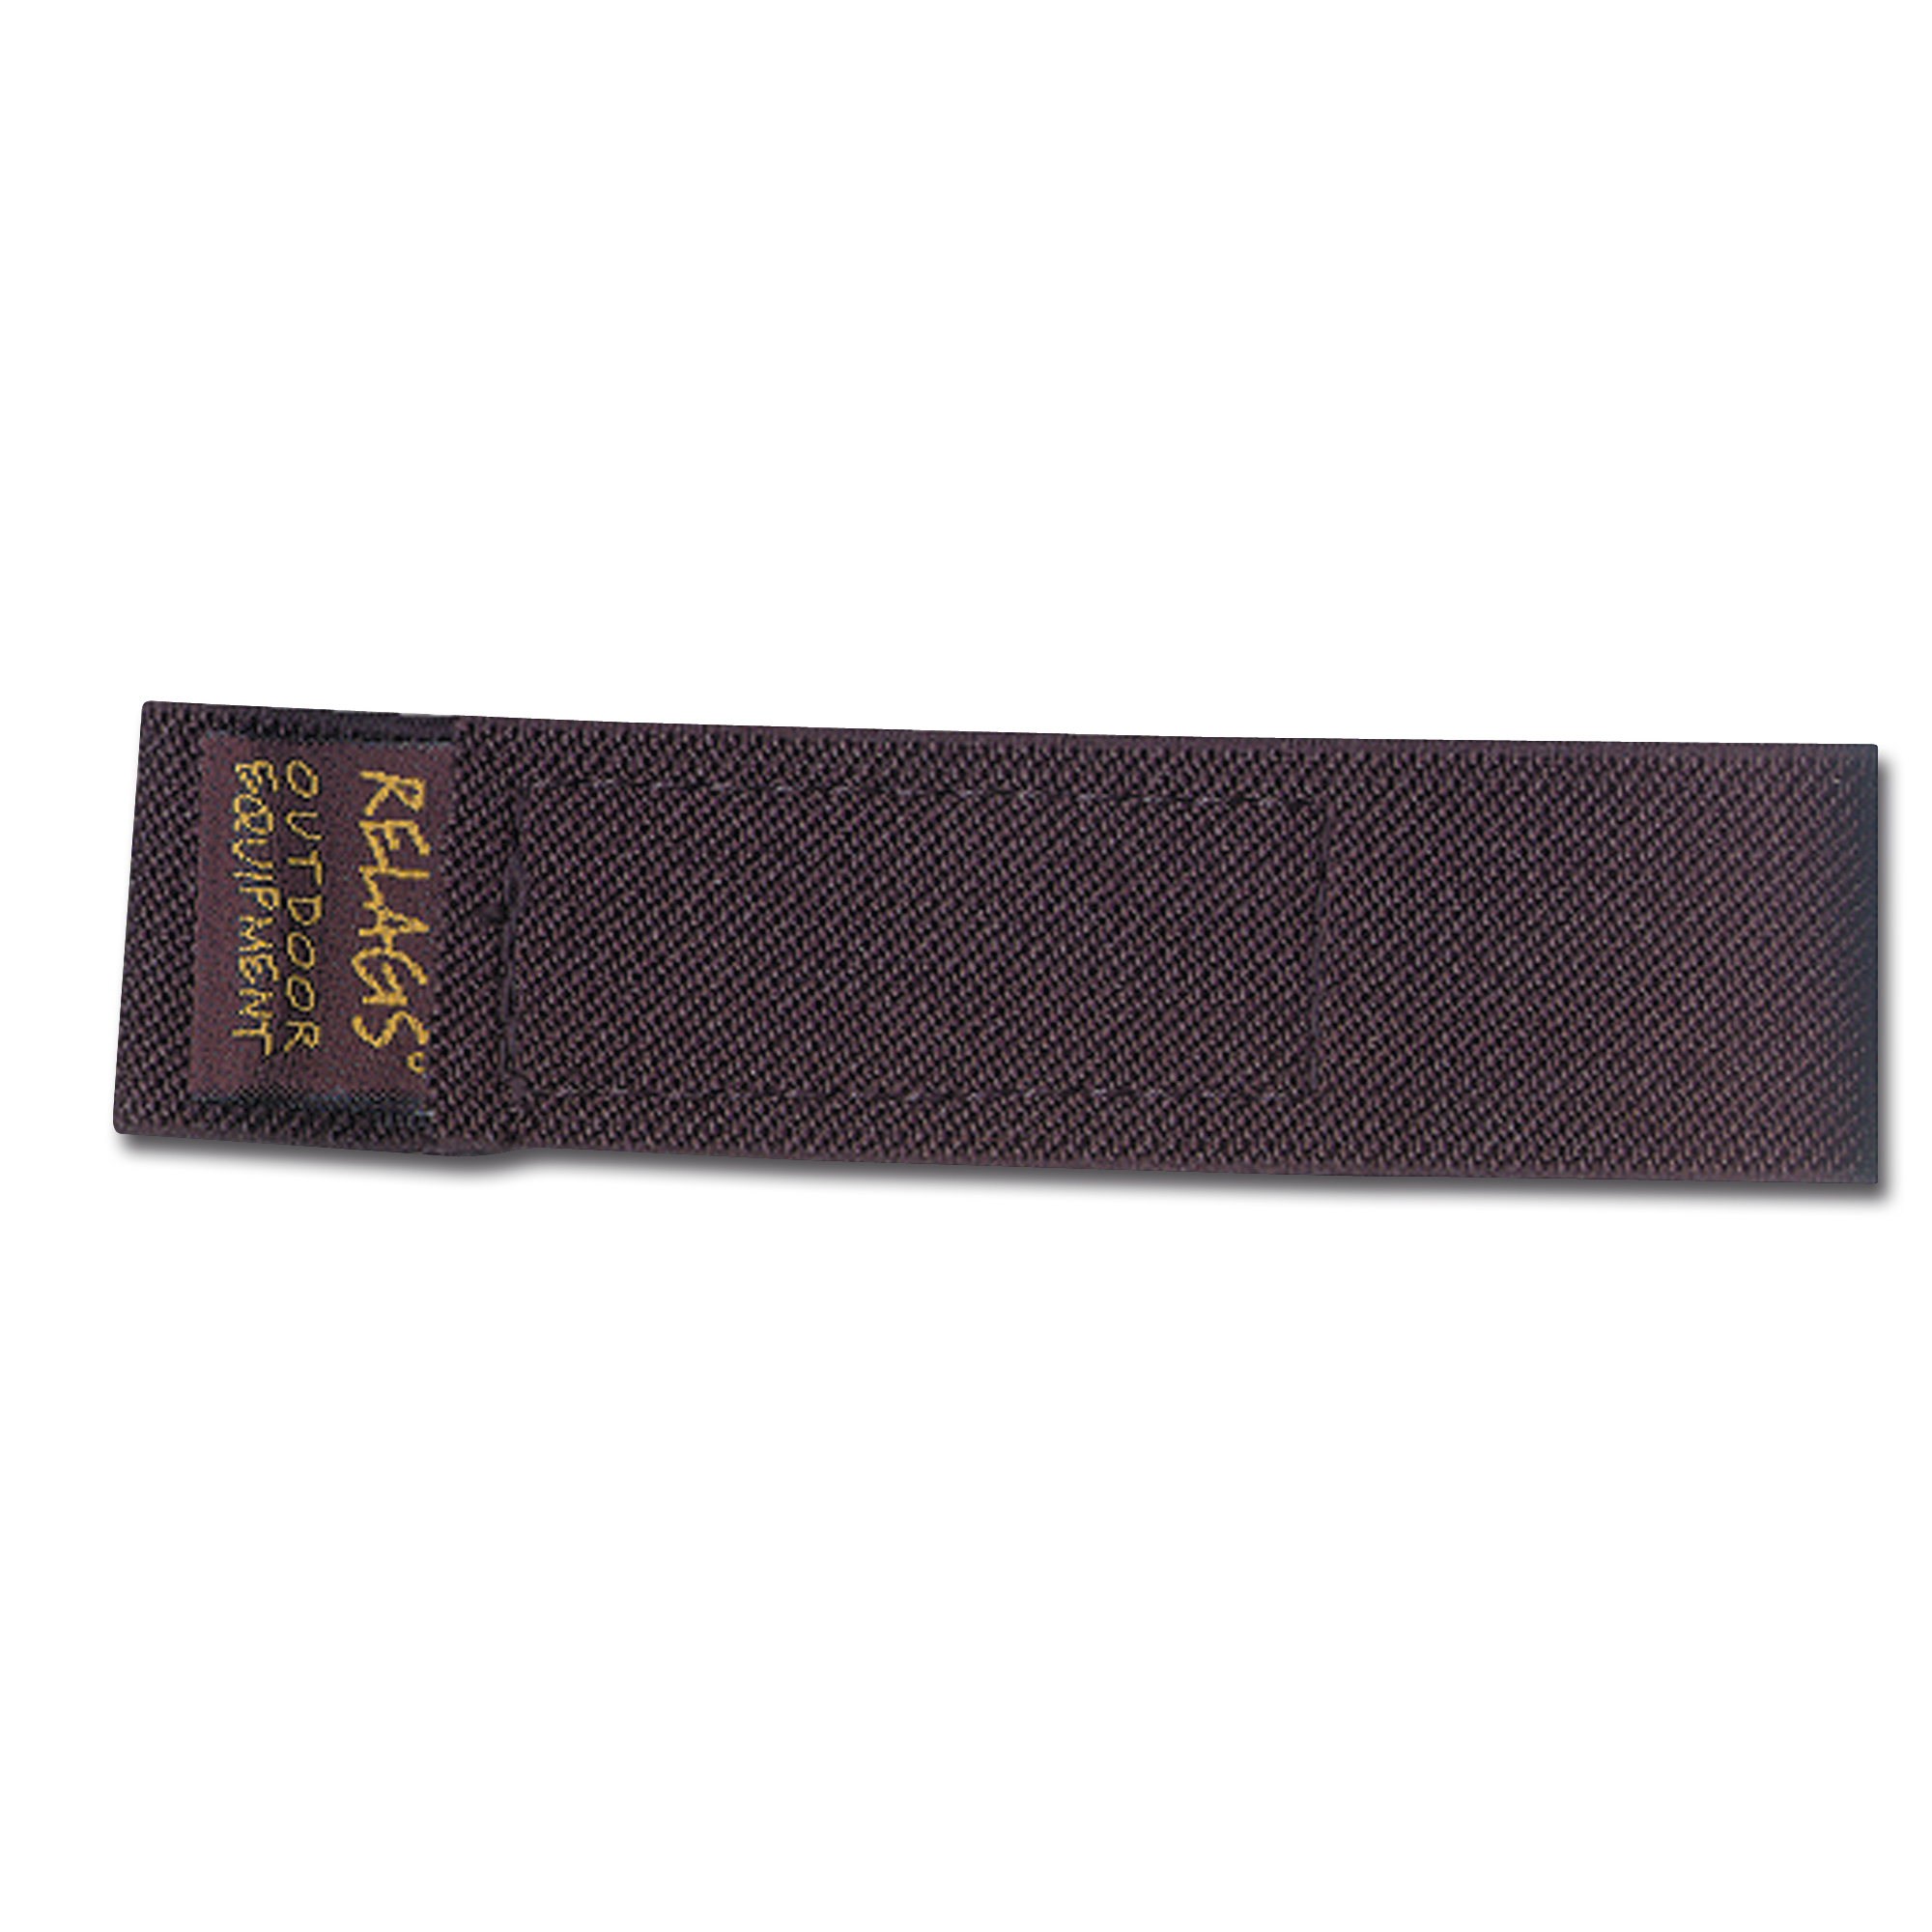 Strapits 30 cm black